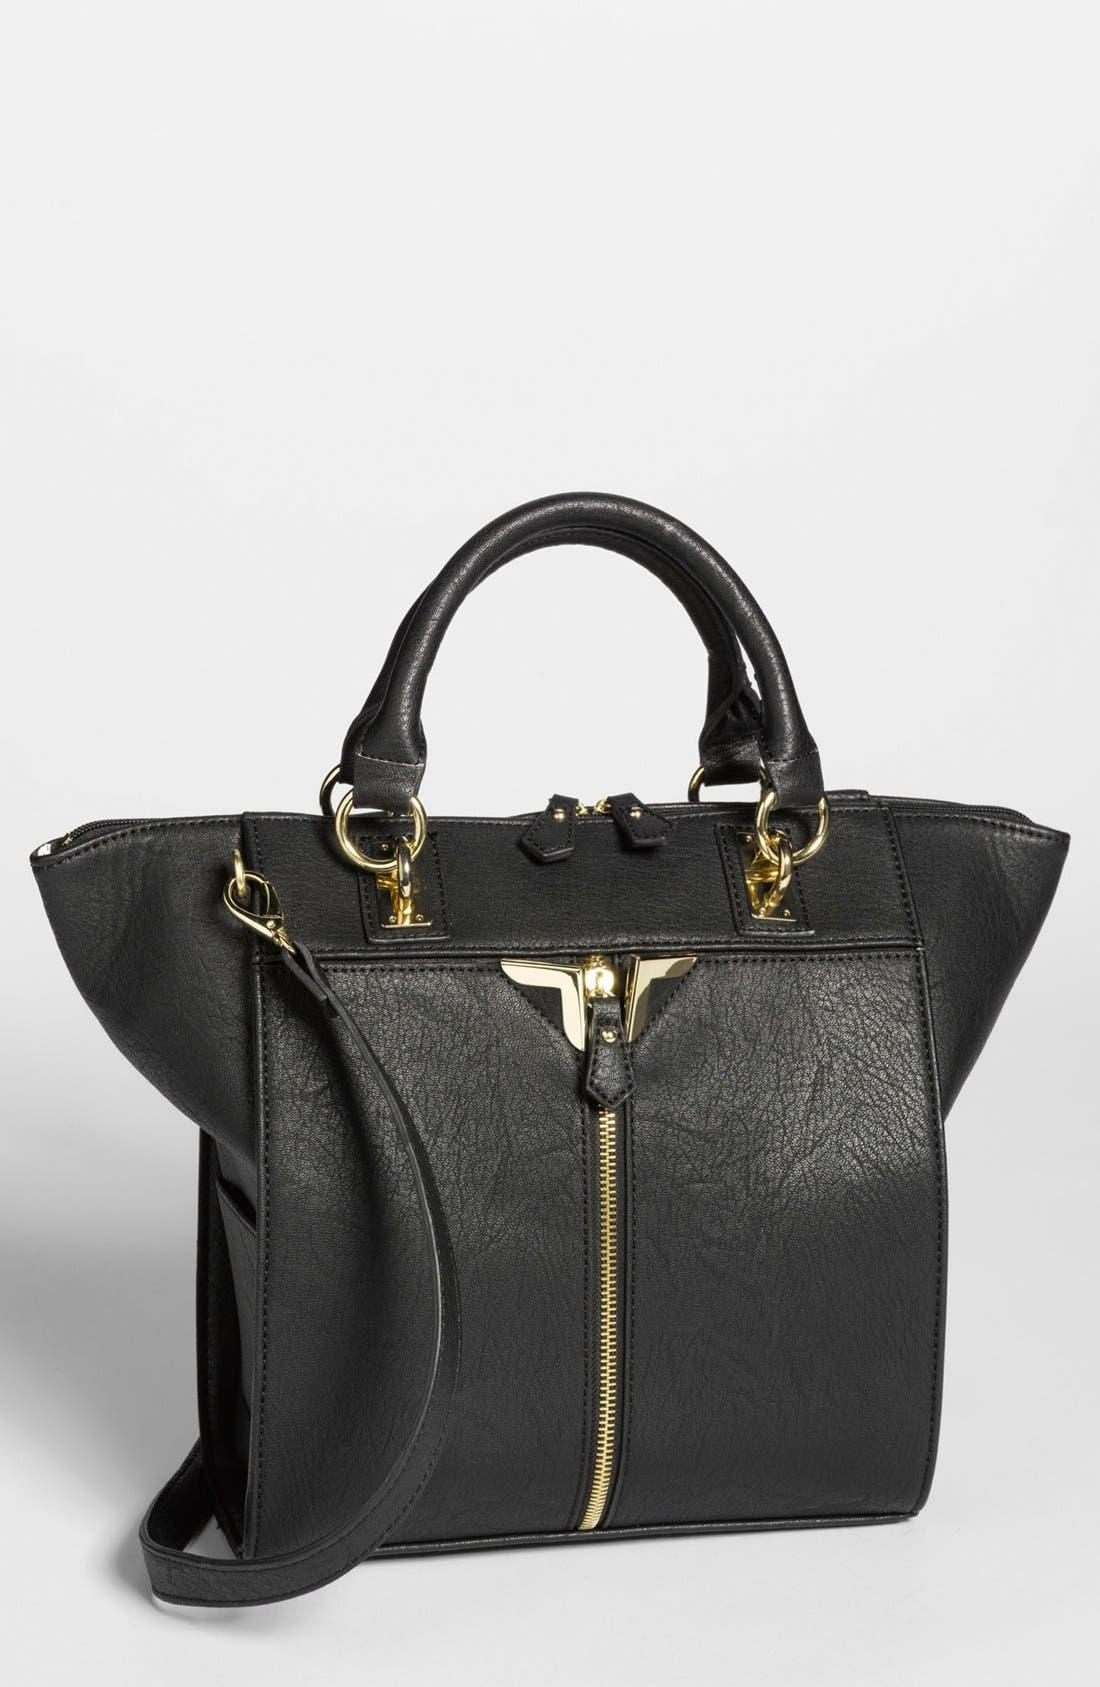 DANIELLE NICOLE 'Alexa' Faux Leather Satchel, Medium, Main, color, 001